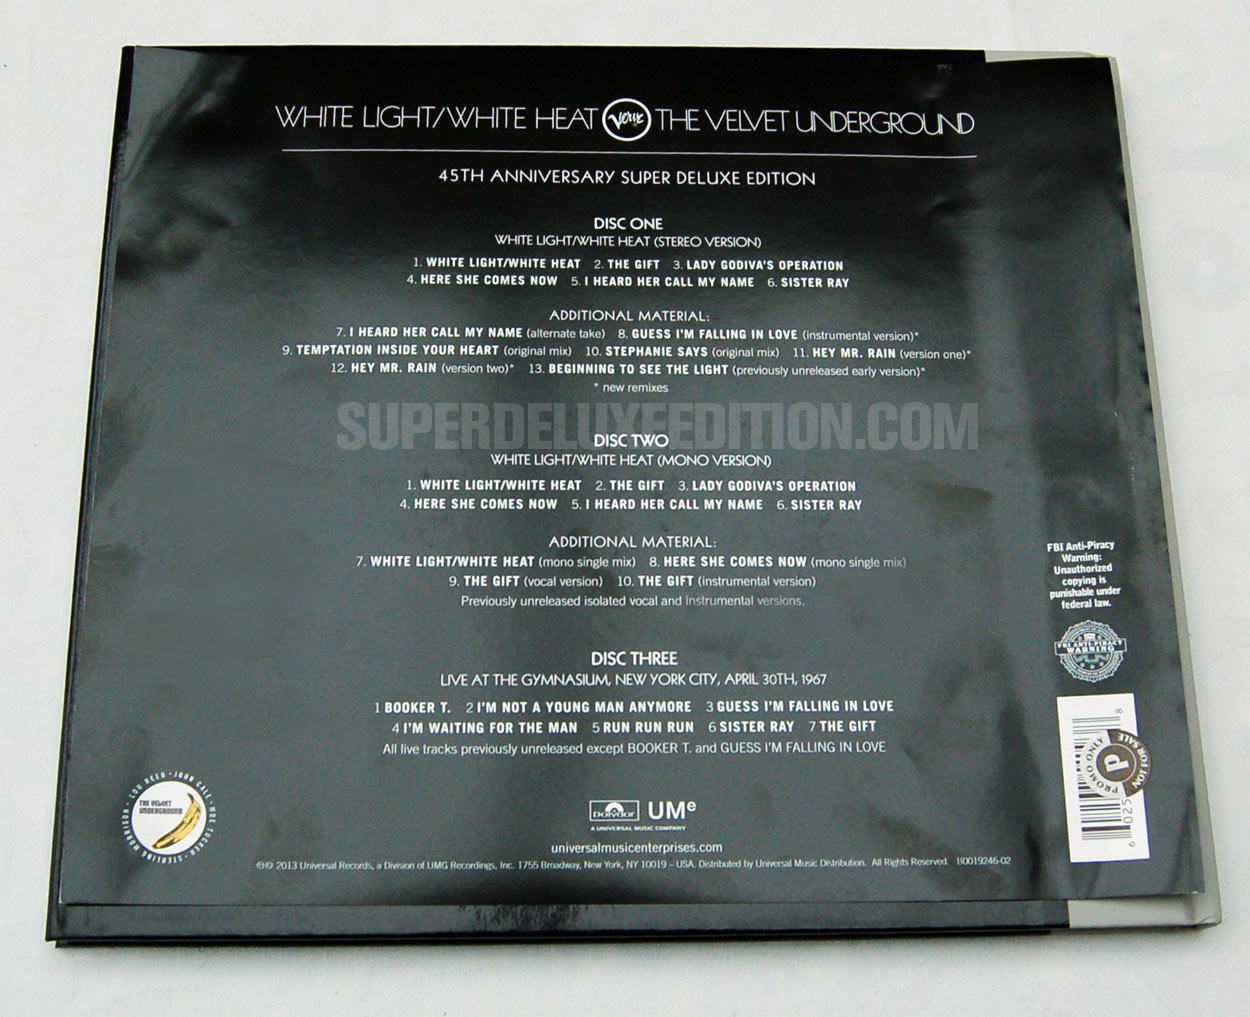 FIRST PICTURES: The Velvet Underground: White Light / White Heat Super Deluxe